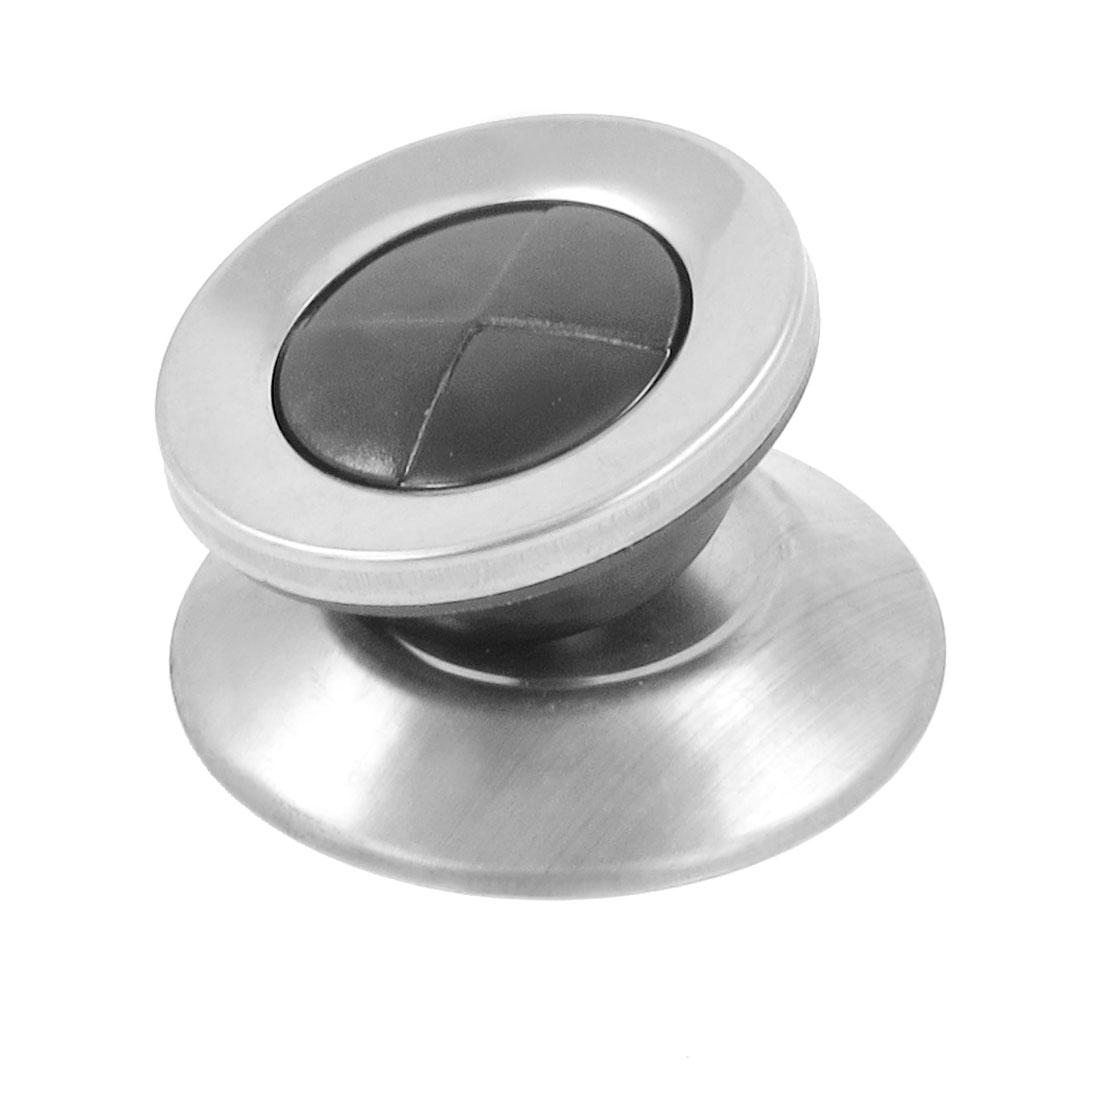 Kitchen Black Silver Tone Metallic Pot Lid Cover Handle Knob